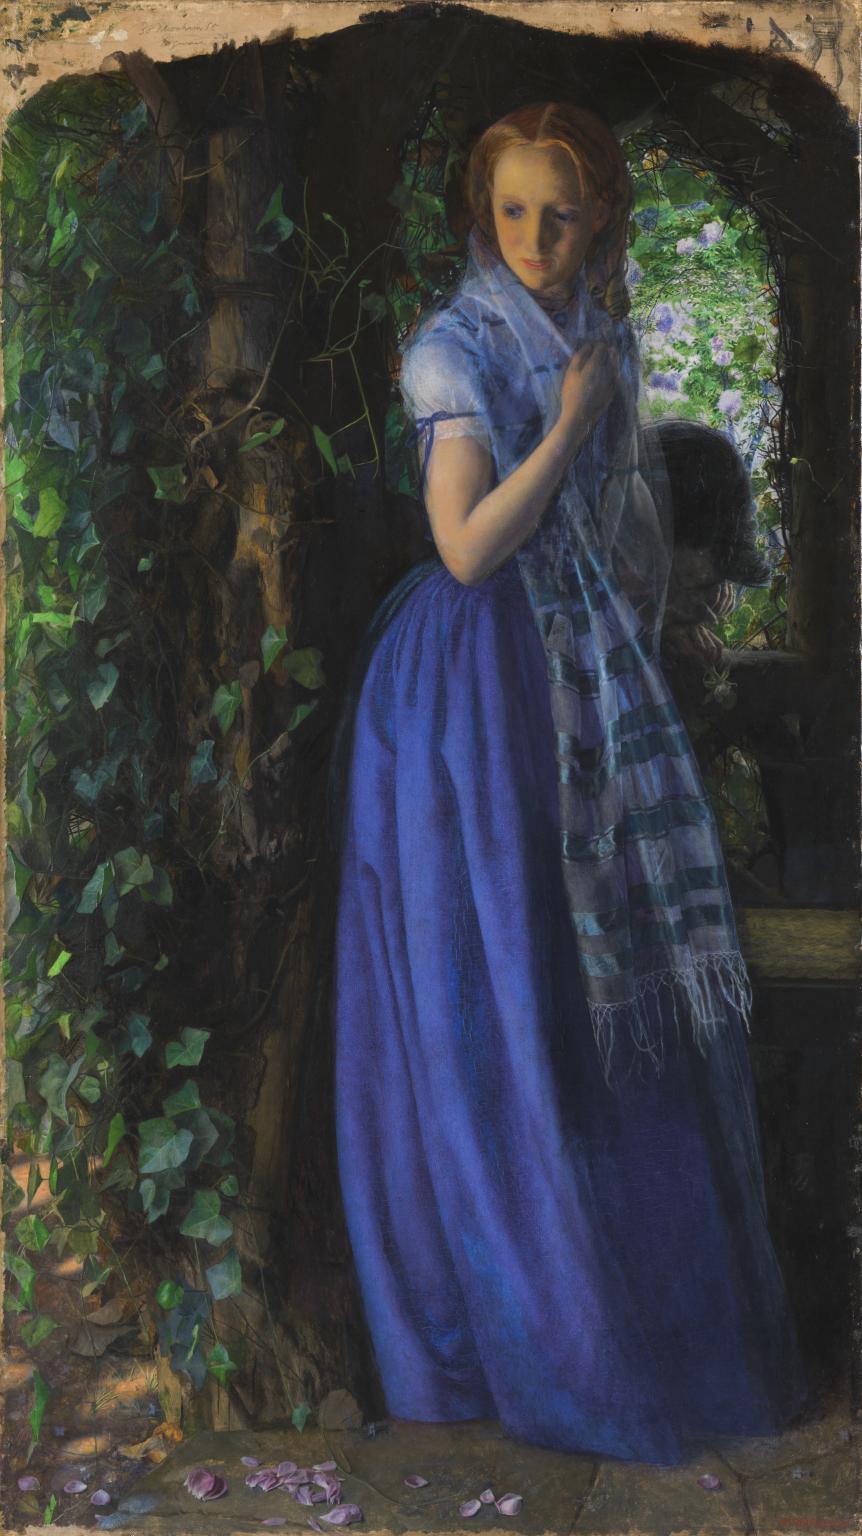 Arthur Hughes, Amore d'aprile (1855-1856; olio su tela, 88,9 x 49,5 cm; Londra, Tate Britain)